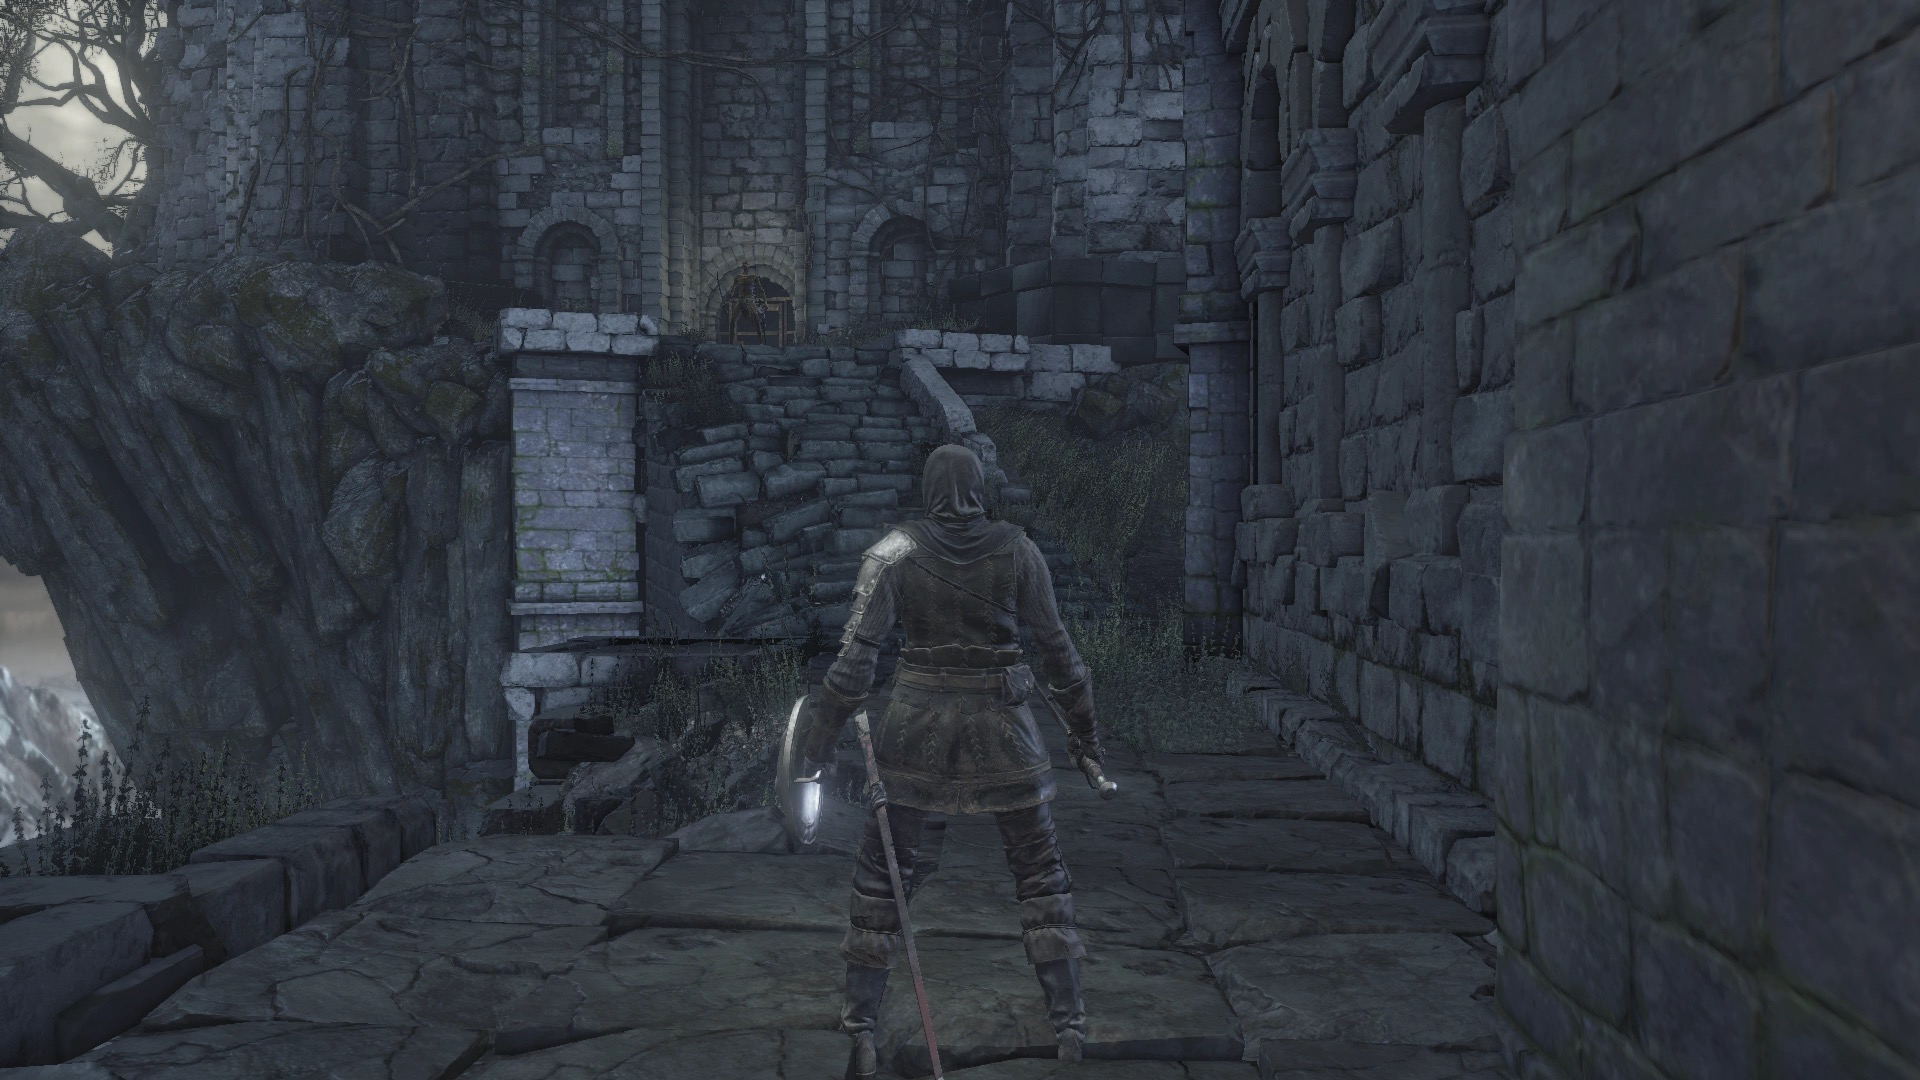 Advantage Max 4 Hd Wallpaper Dark Souls 3 Firelink Shrine Walkthrough Polygon